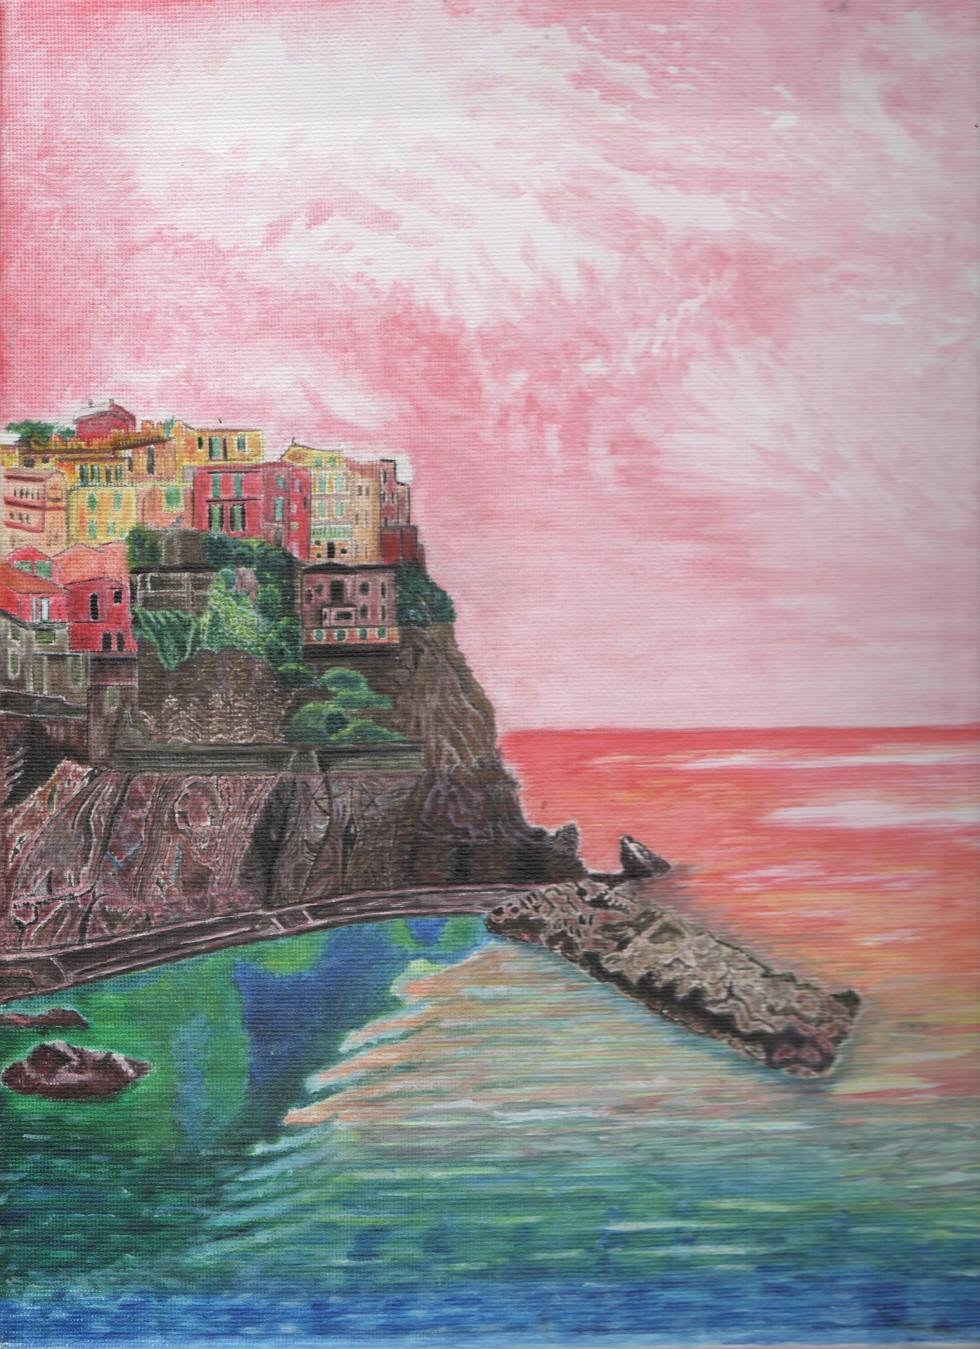 CinqueTerre Italy Italypaintings acrylic freelanceartist cork corkartist irishartist printsavailable